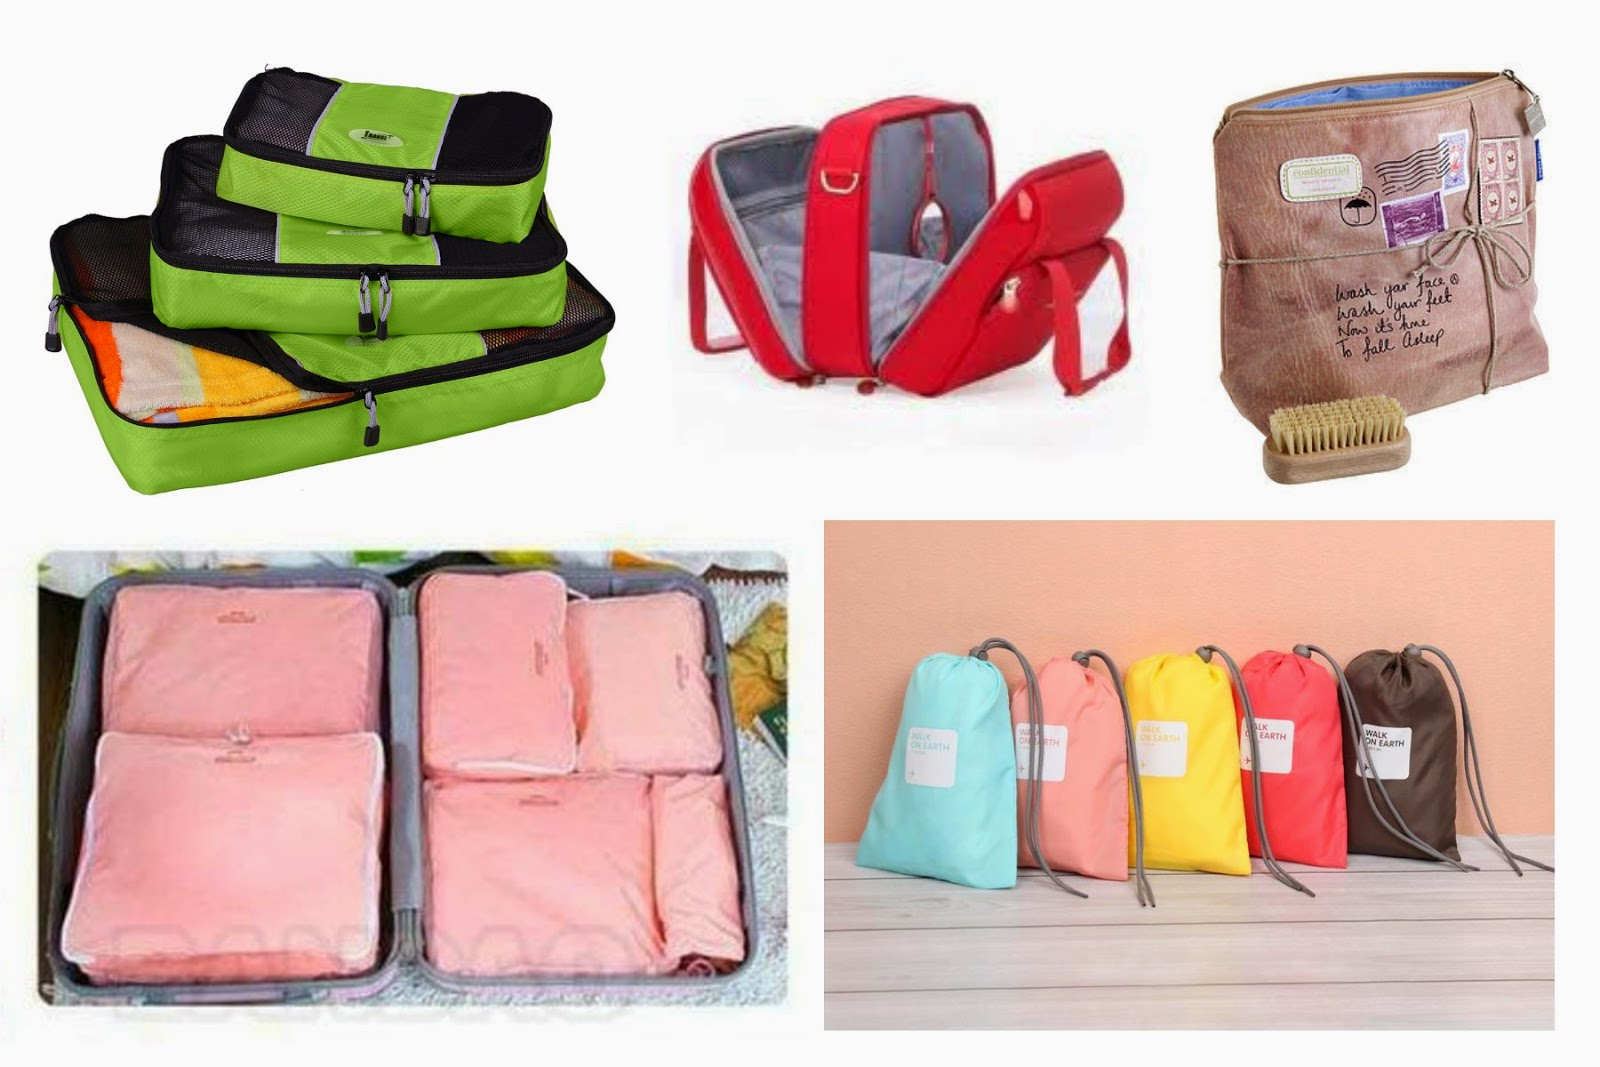 Regalos para viajeros: bolsas organizadoras maleta